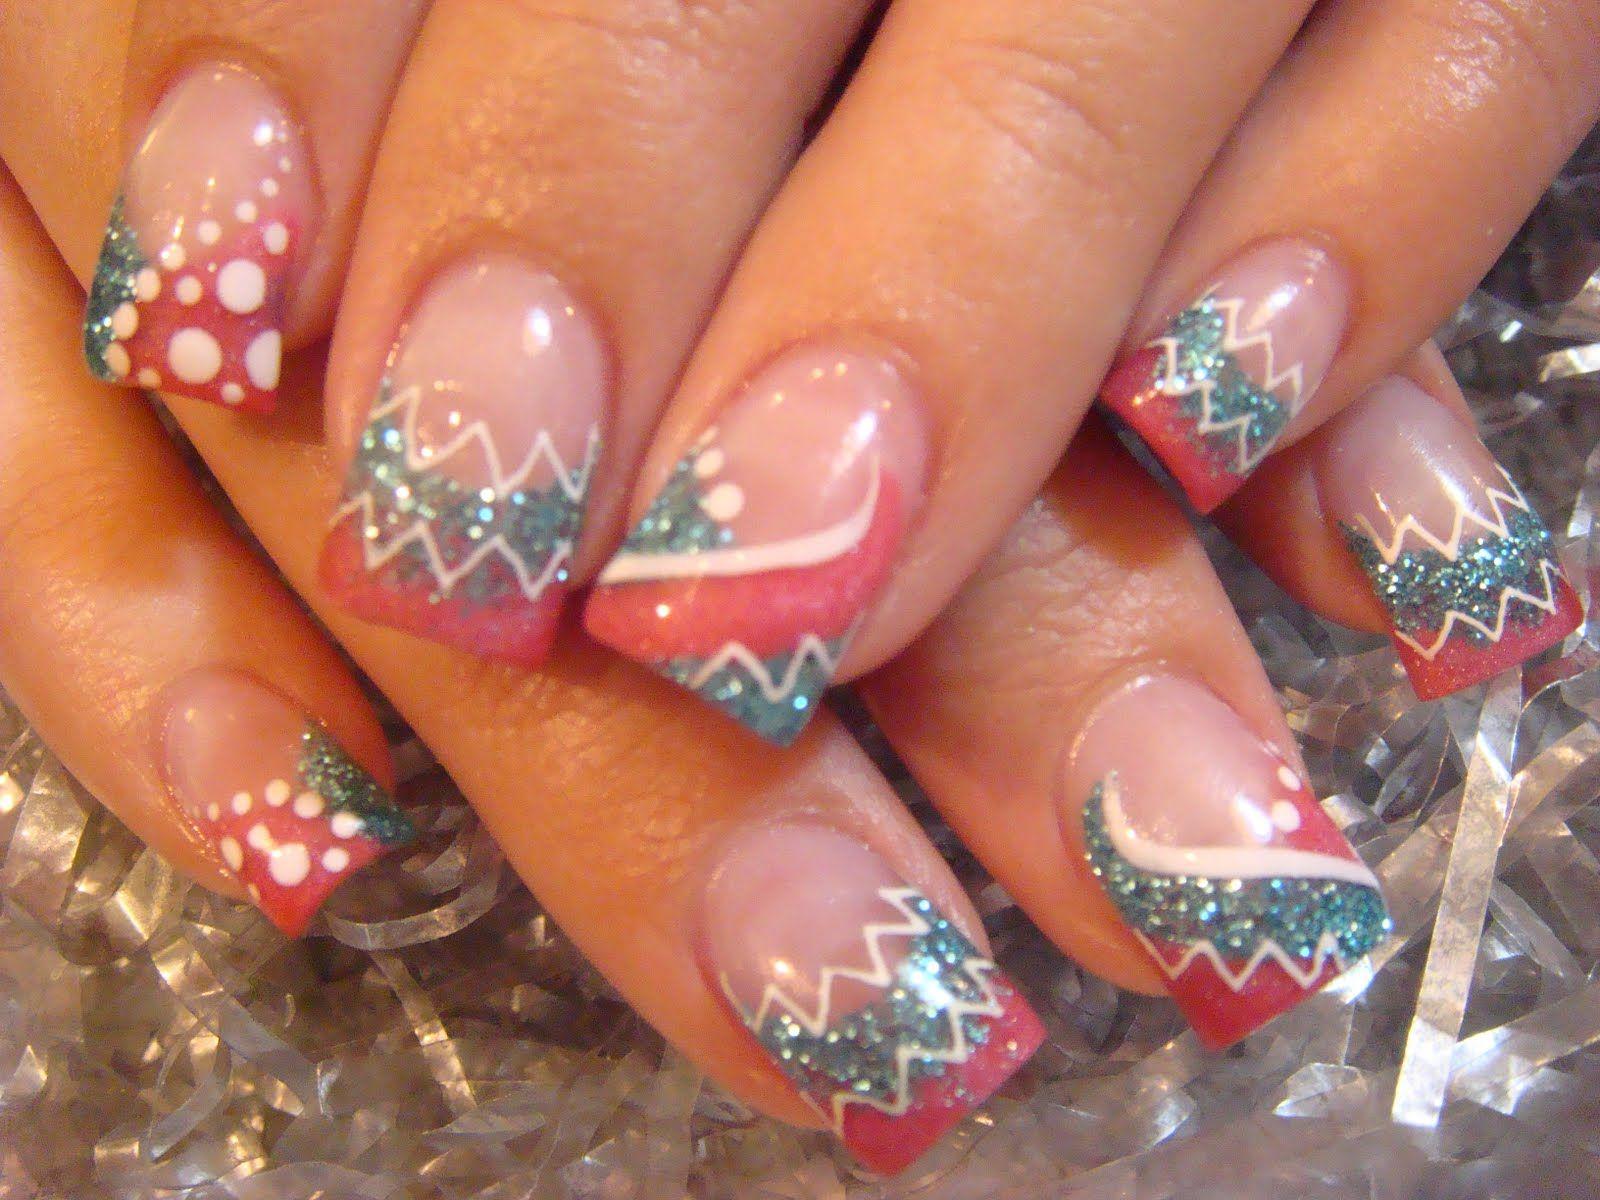 Pin by Kaytlynn Lolas on Nails | Pinterest